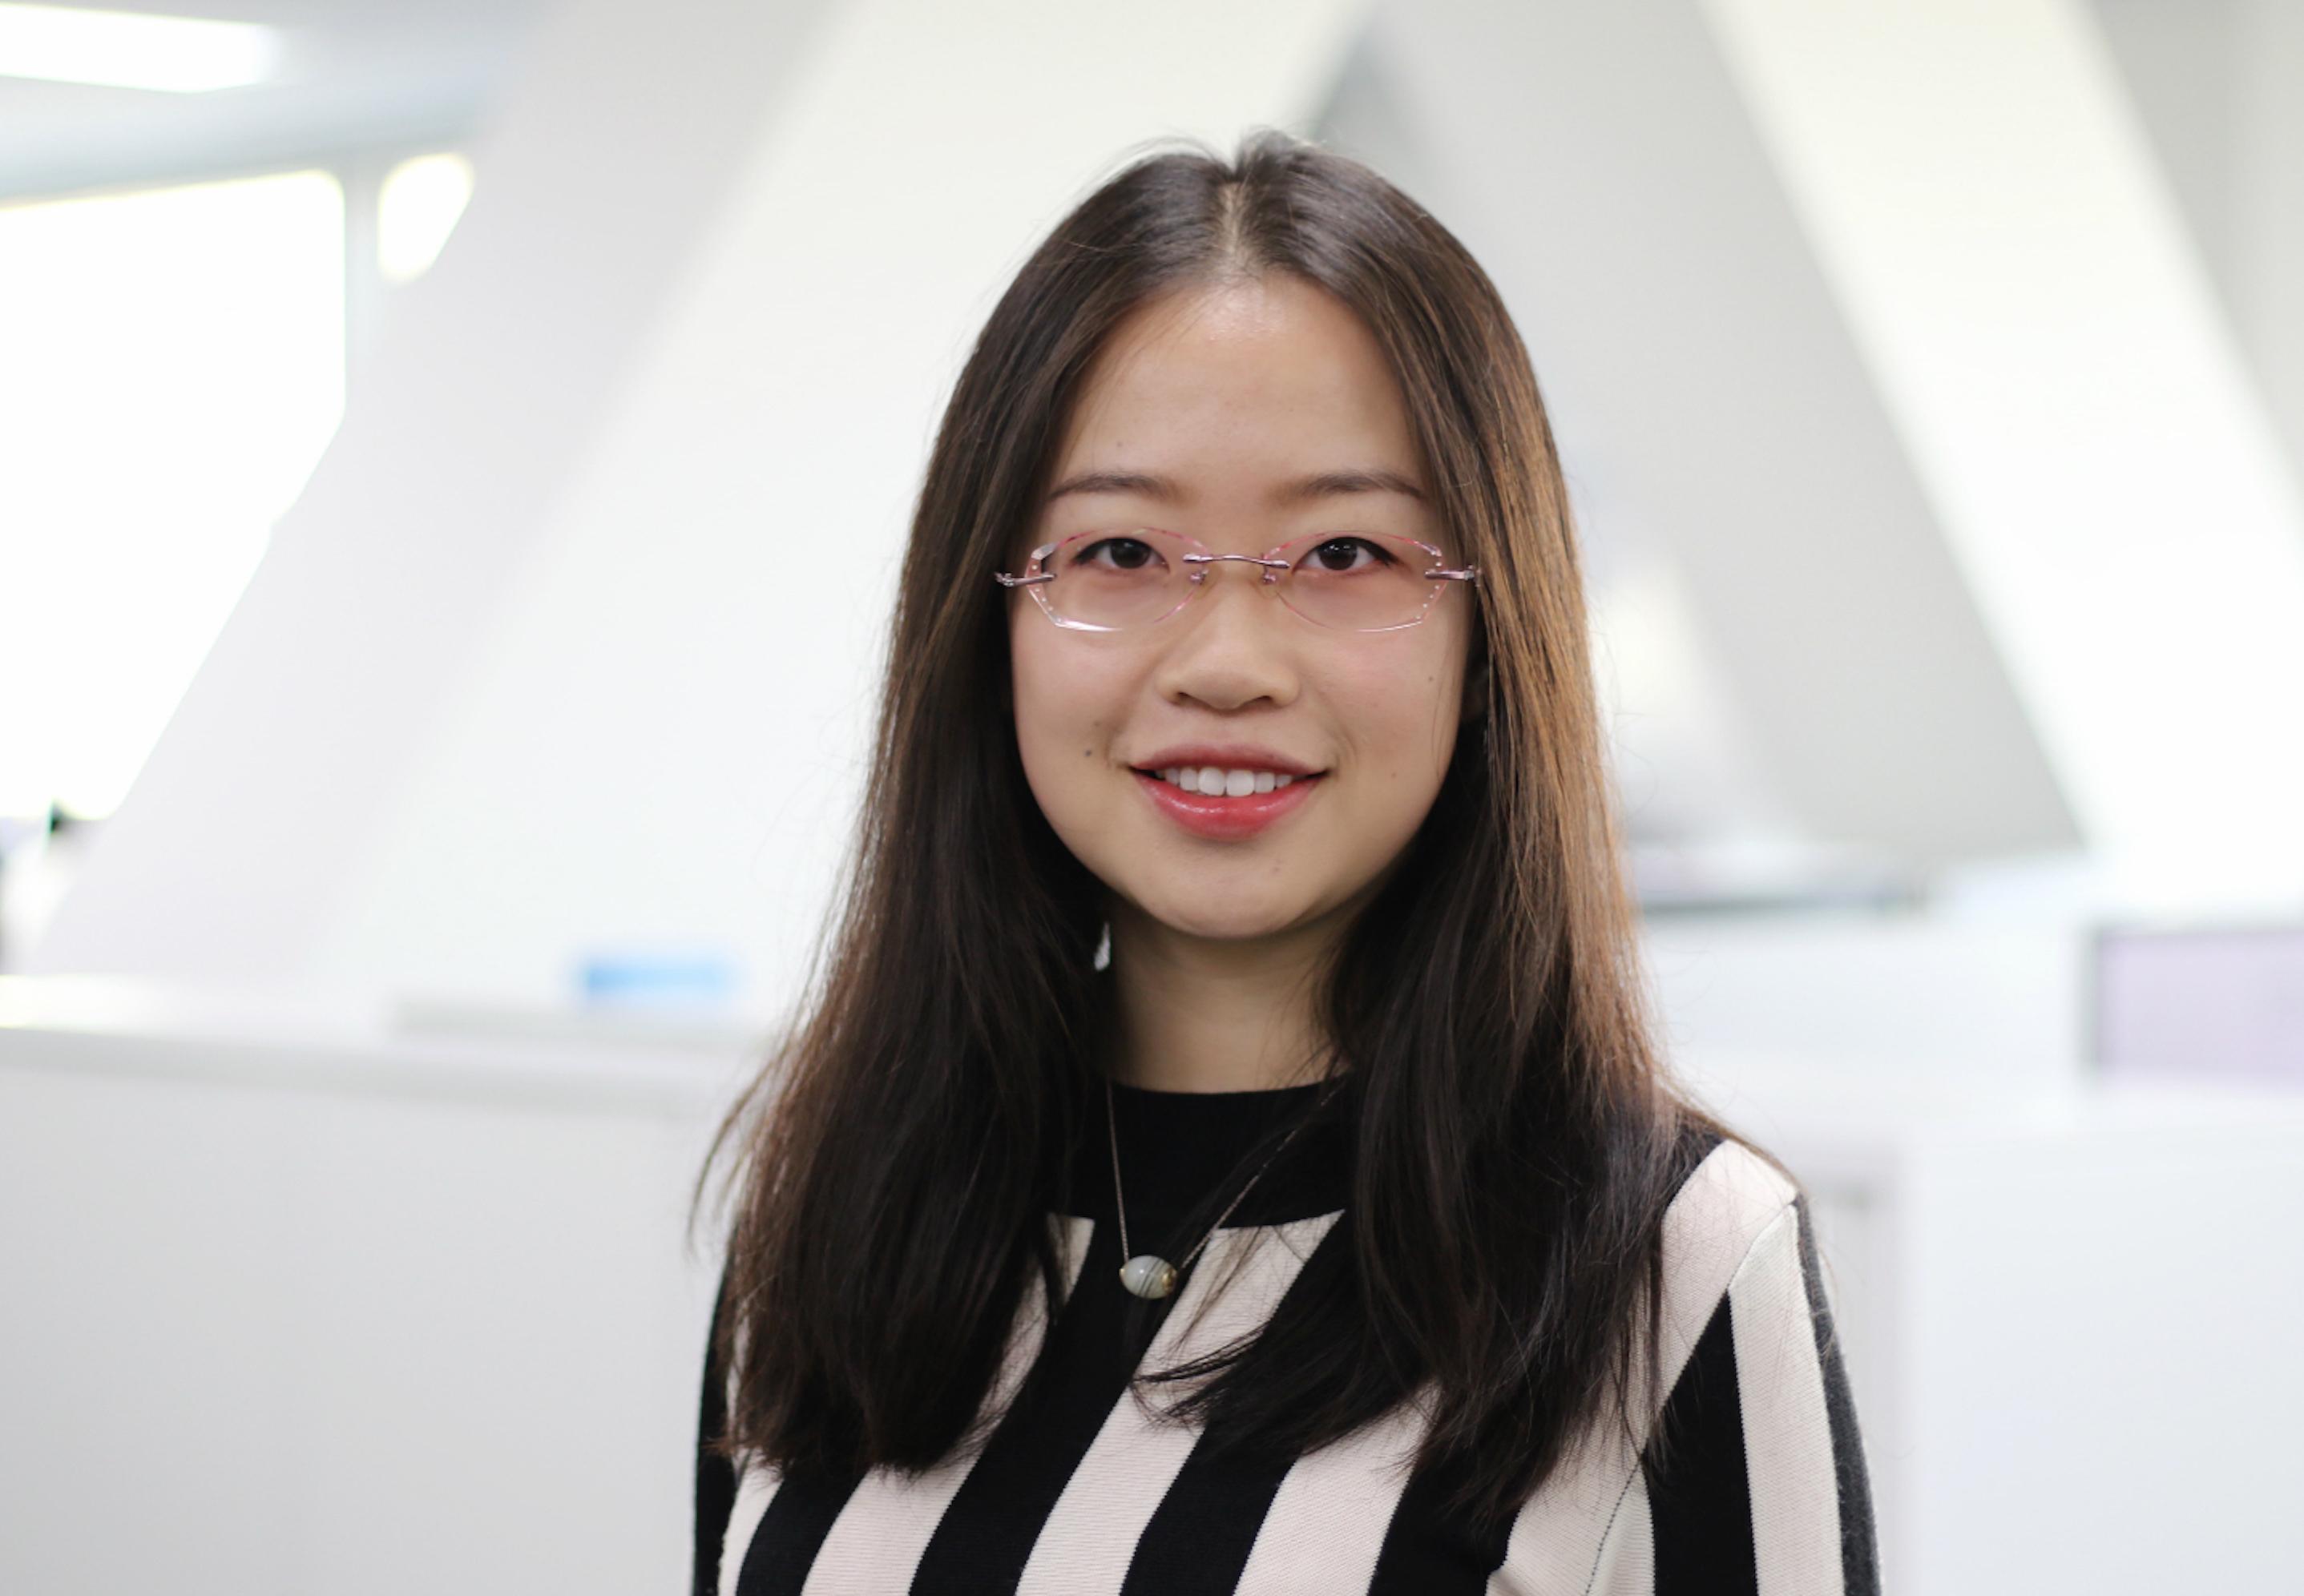 Wendy Li